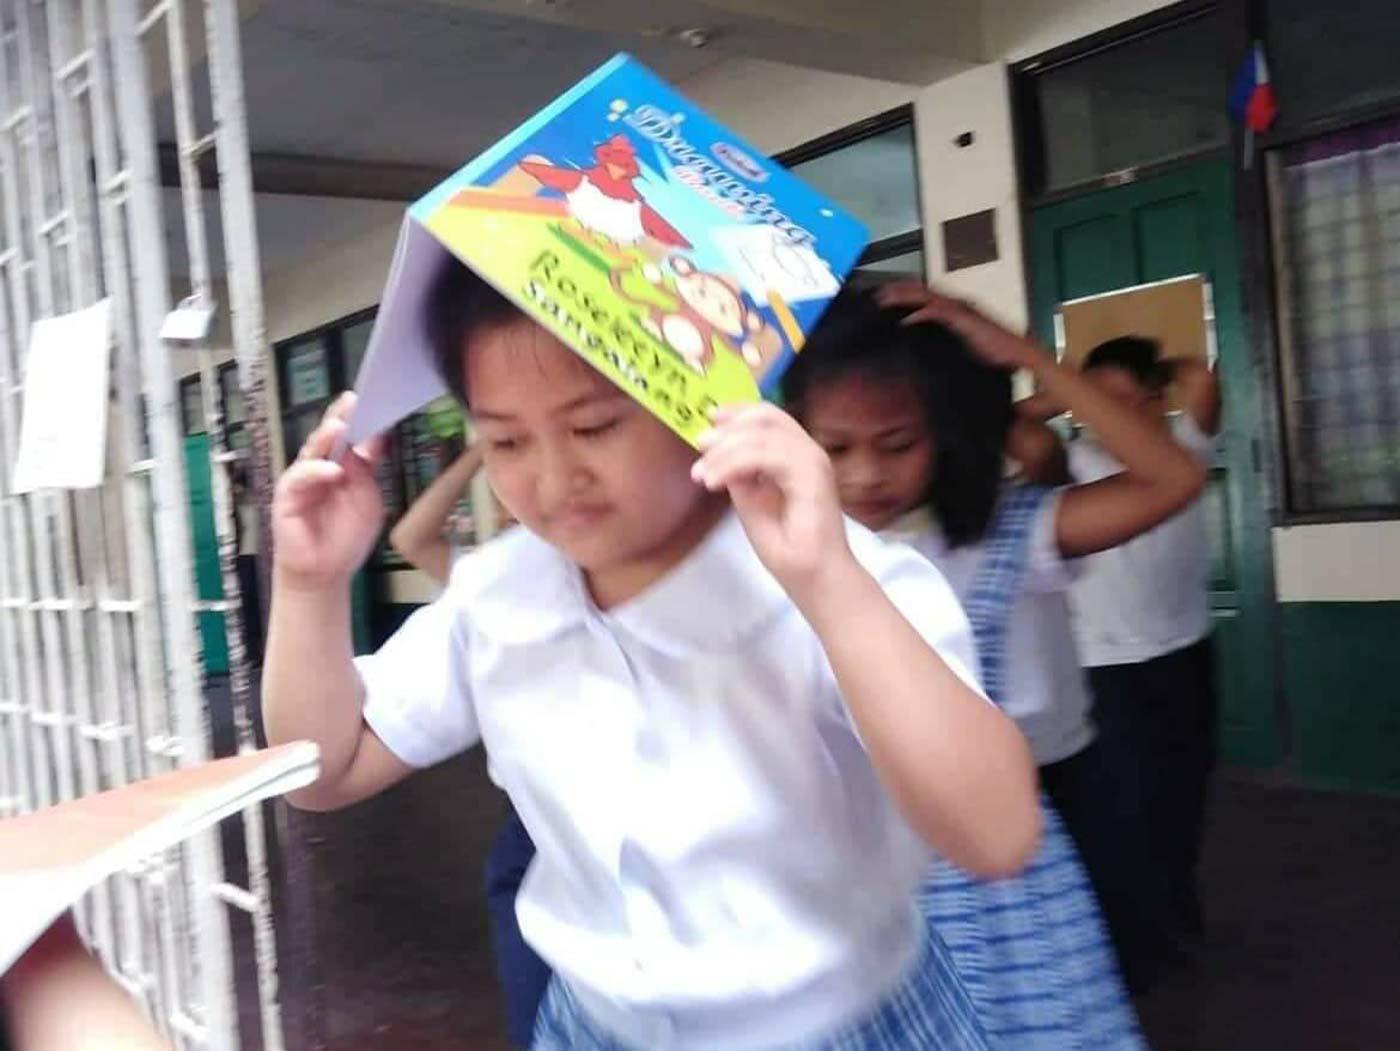 EVACUATE. Pupils of Salapungan Elementary School in Angeles City, Pampanga. Photo by Helen Juguilon